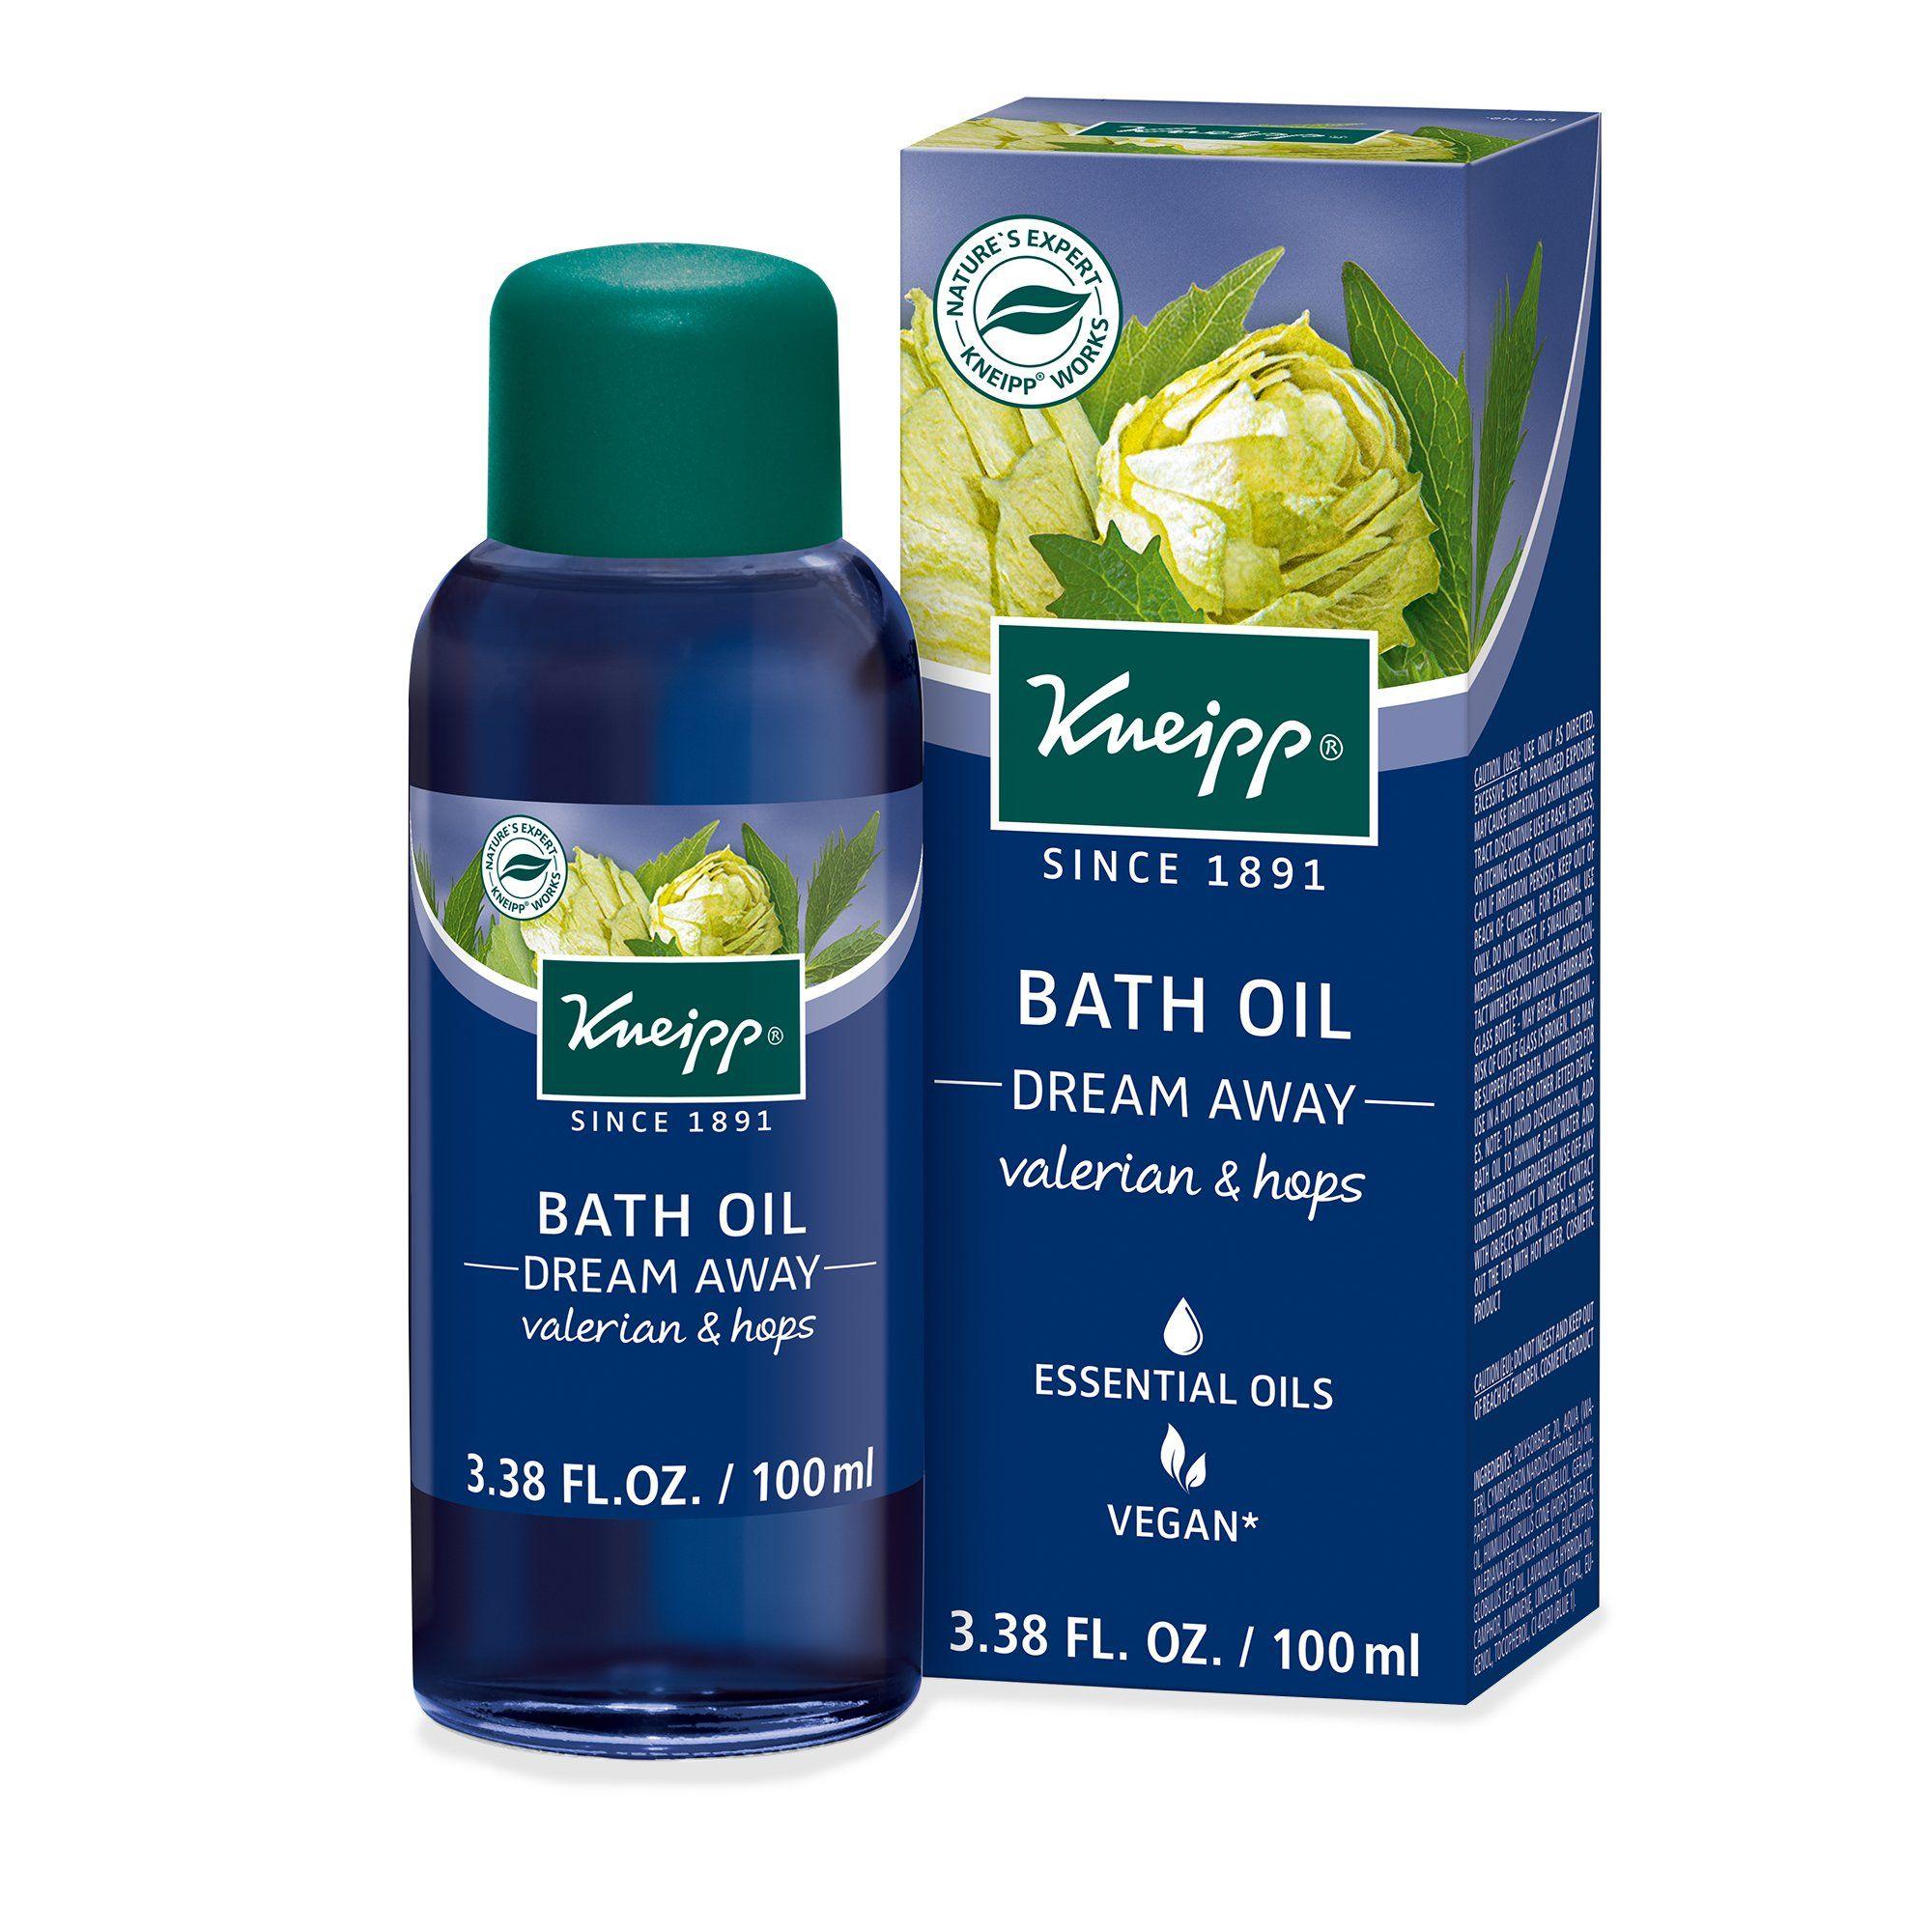 Kneipp Dream Away Bath Oil In 2020 Herbal Bath Herbalism Bath Oils